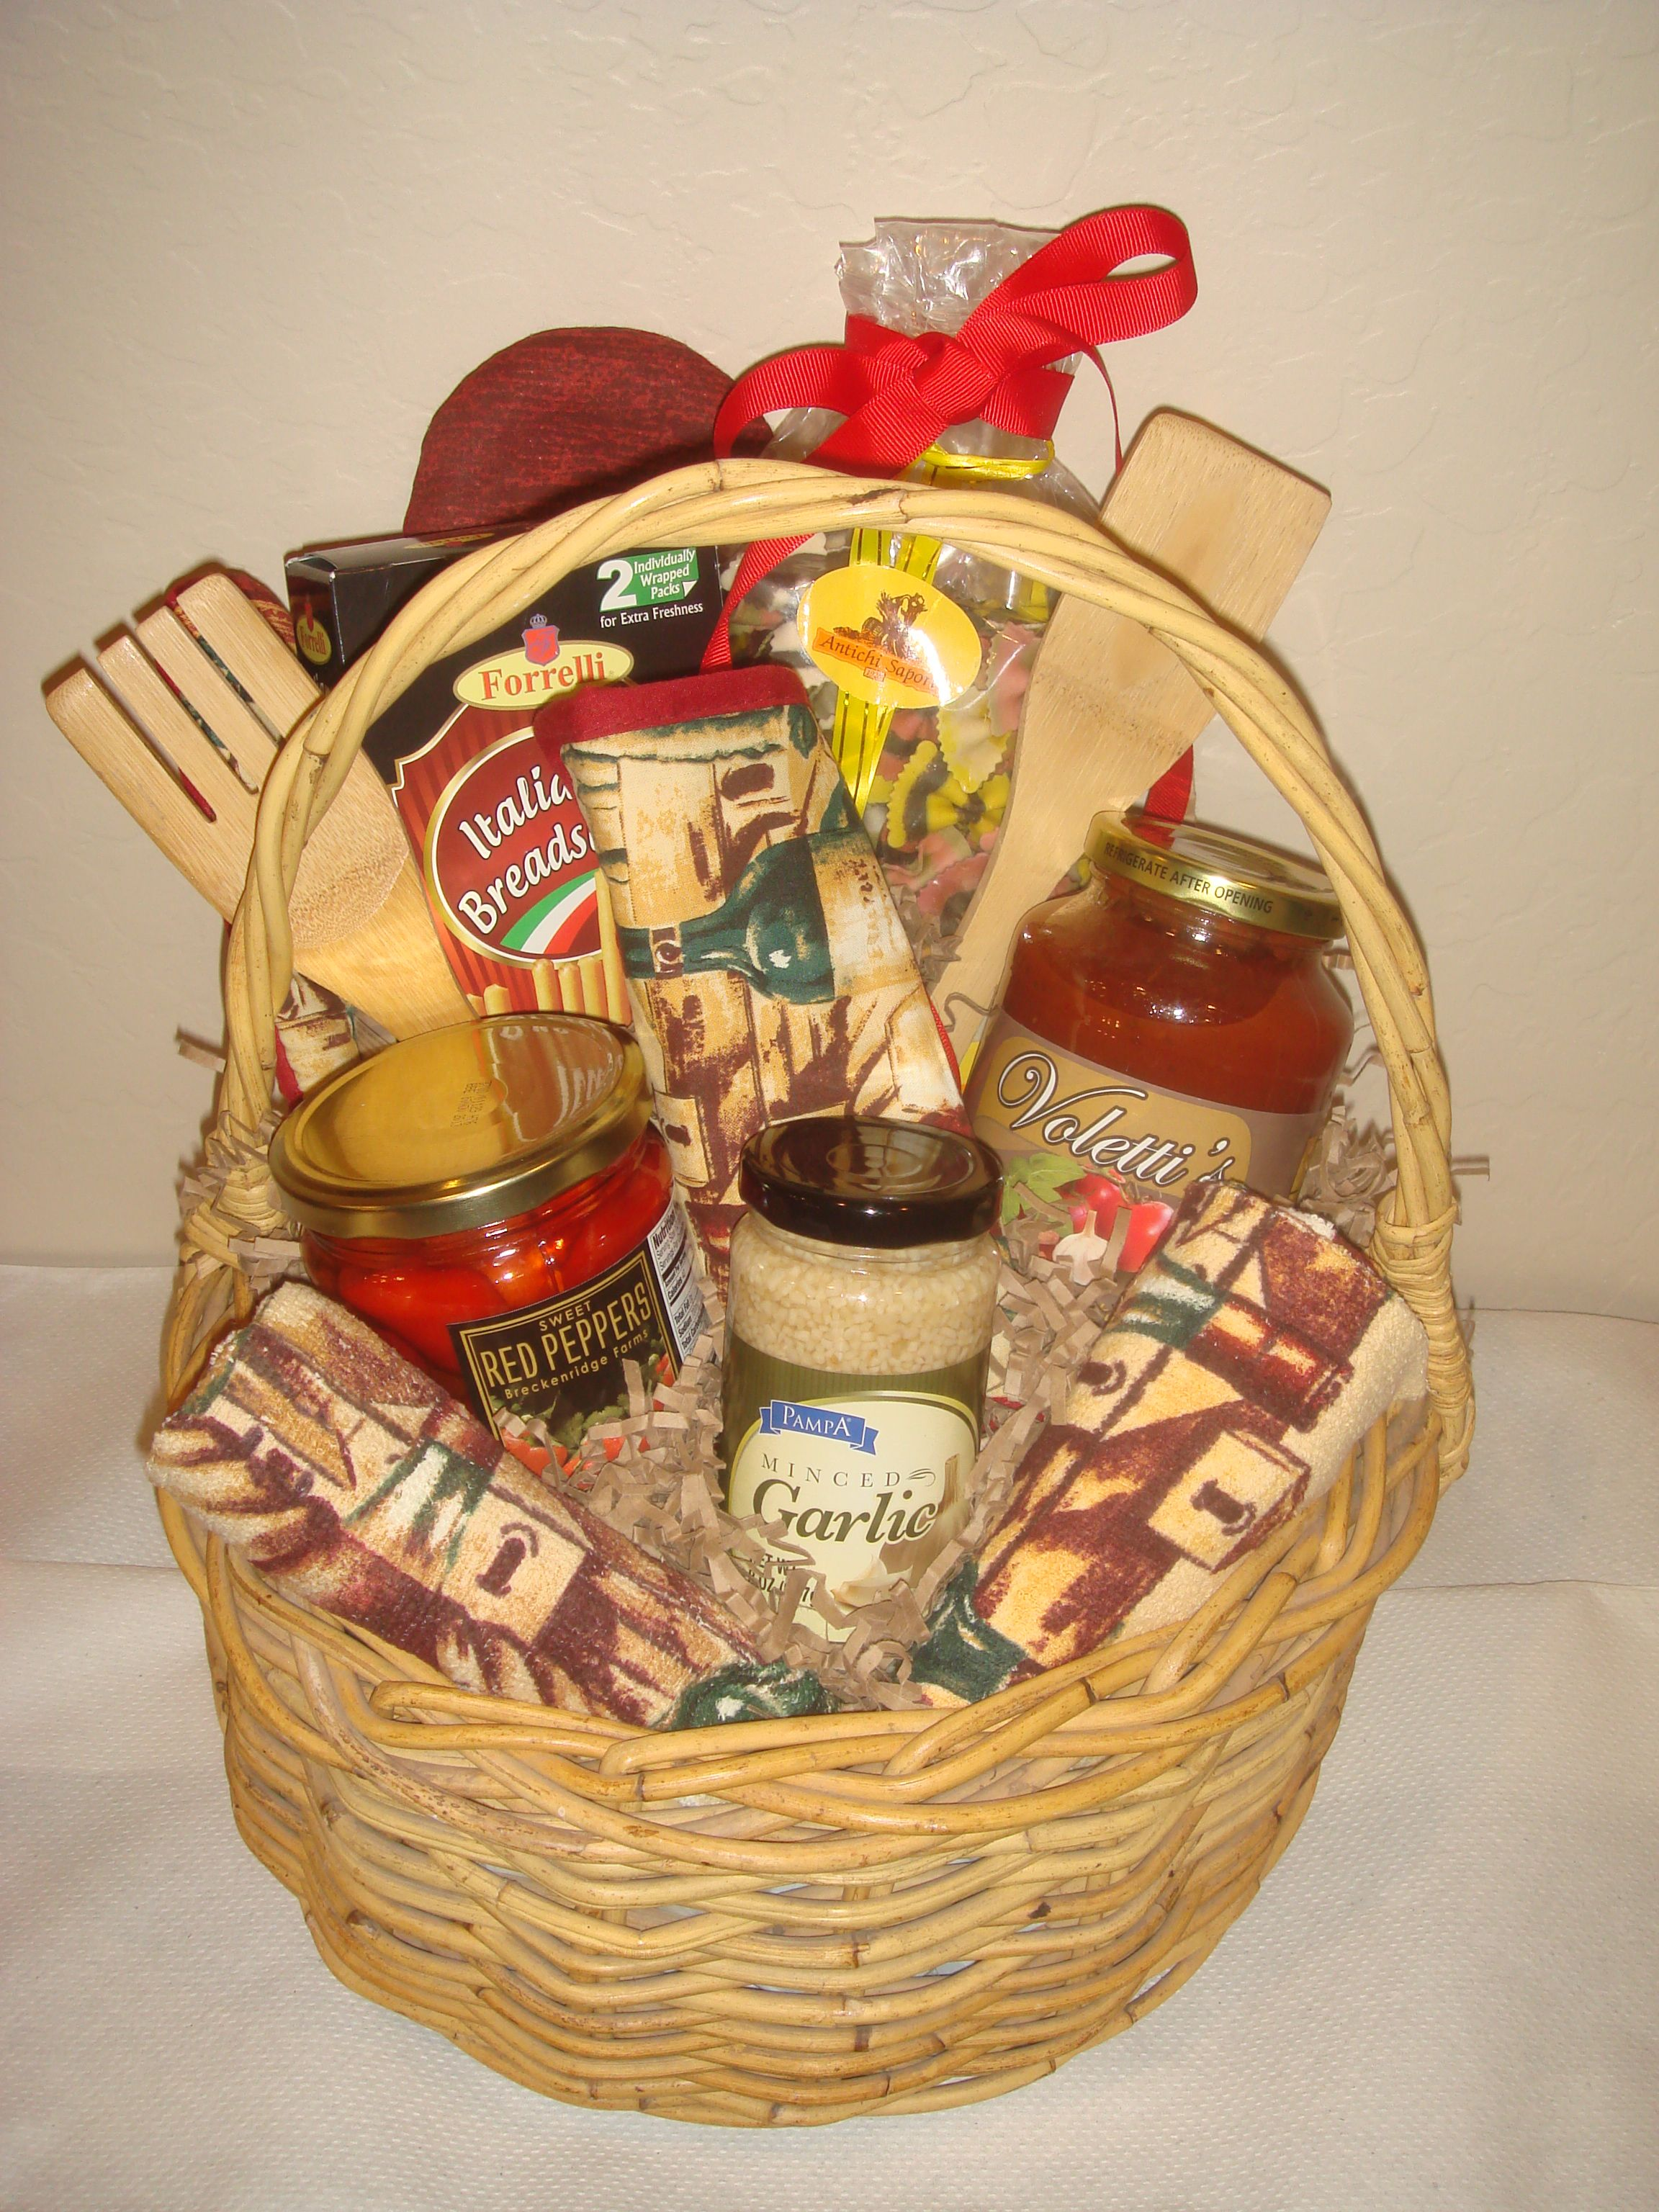 Top 22 Food Gift Basket Ideas - Best Gift Ideas ...